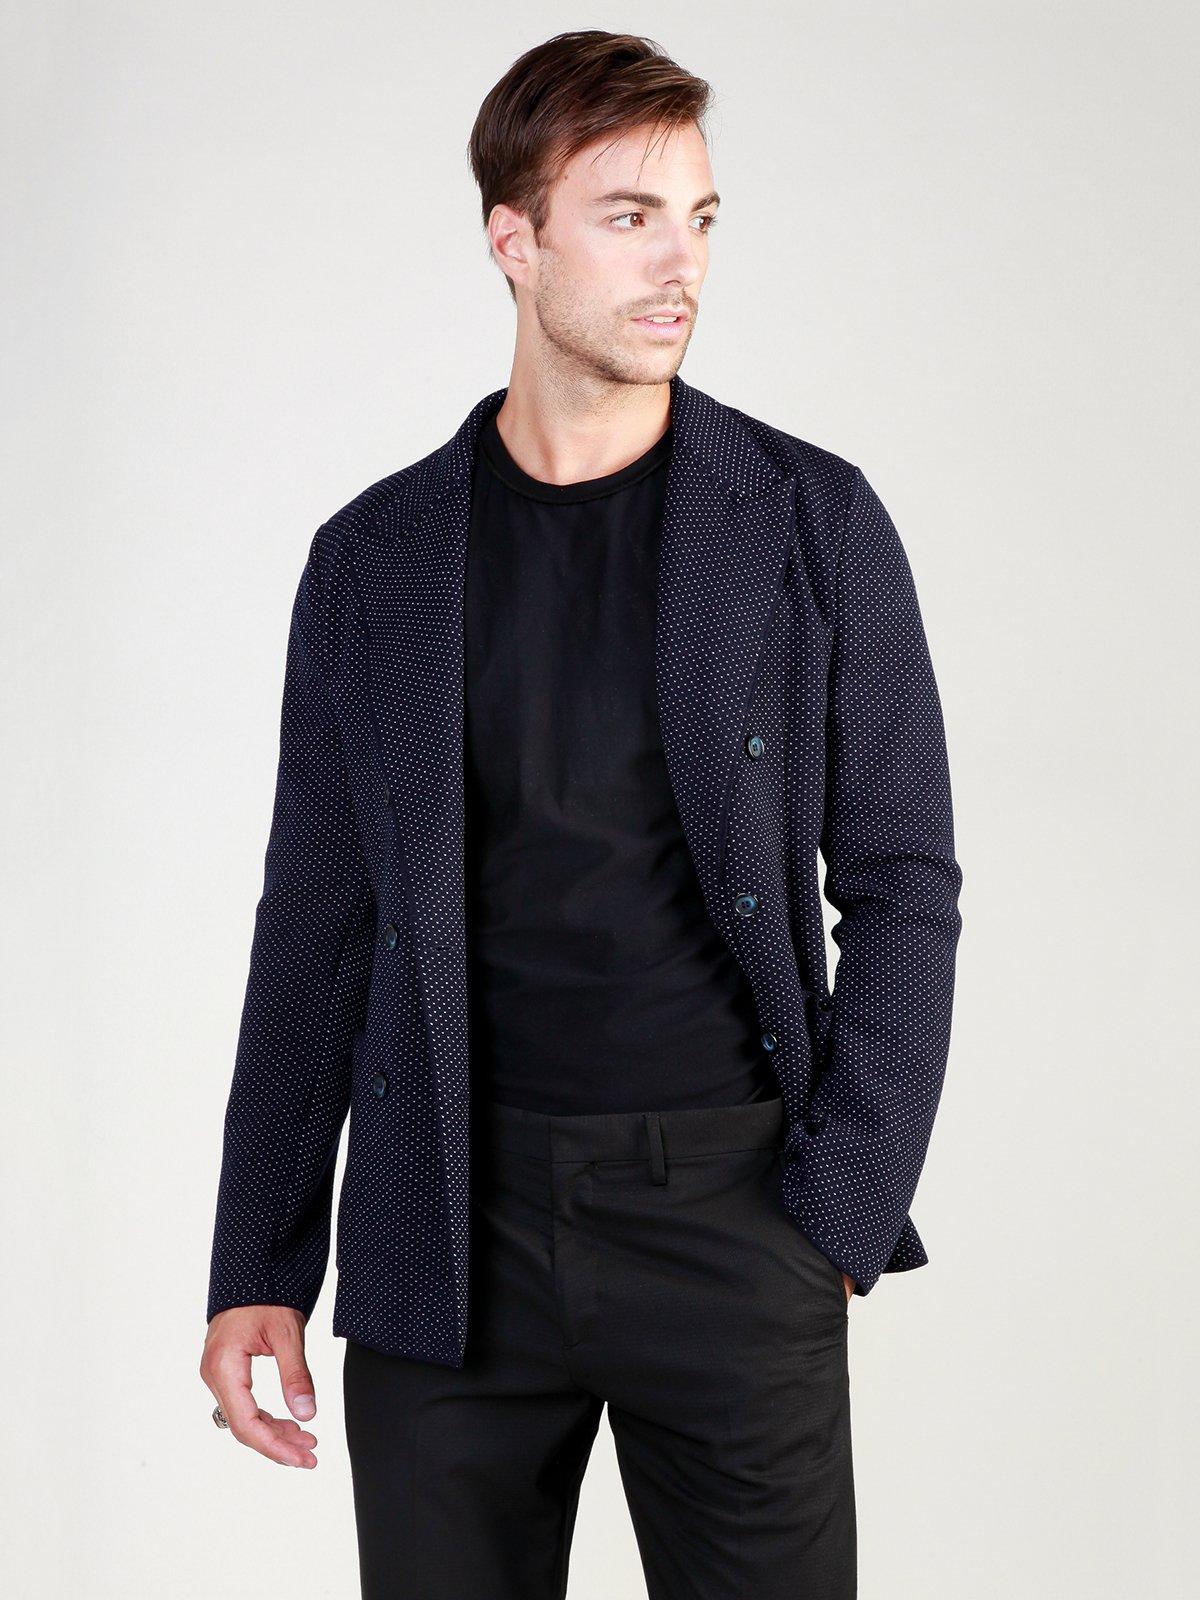 Пиджак темно-синий в рисунок | 3748934 | фото 3